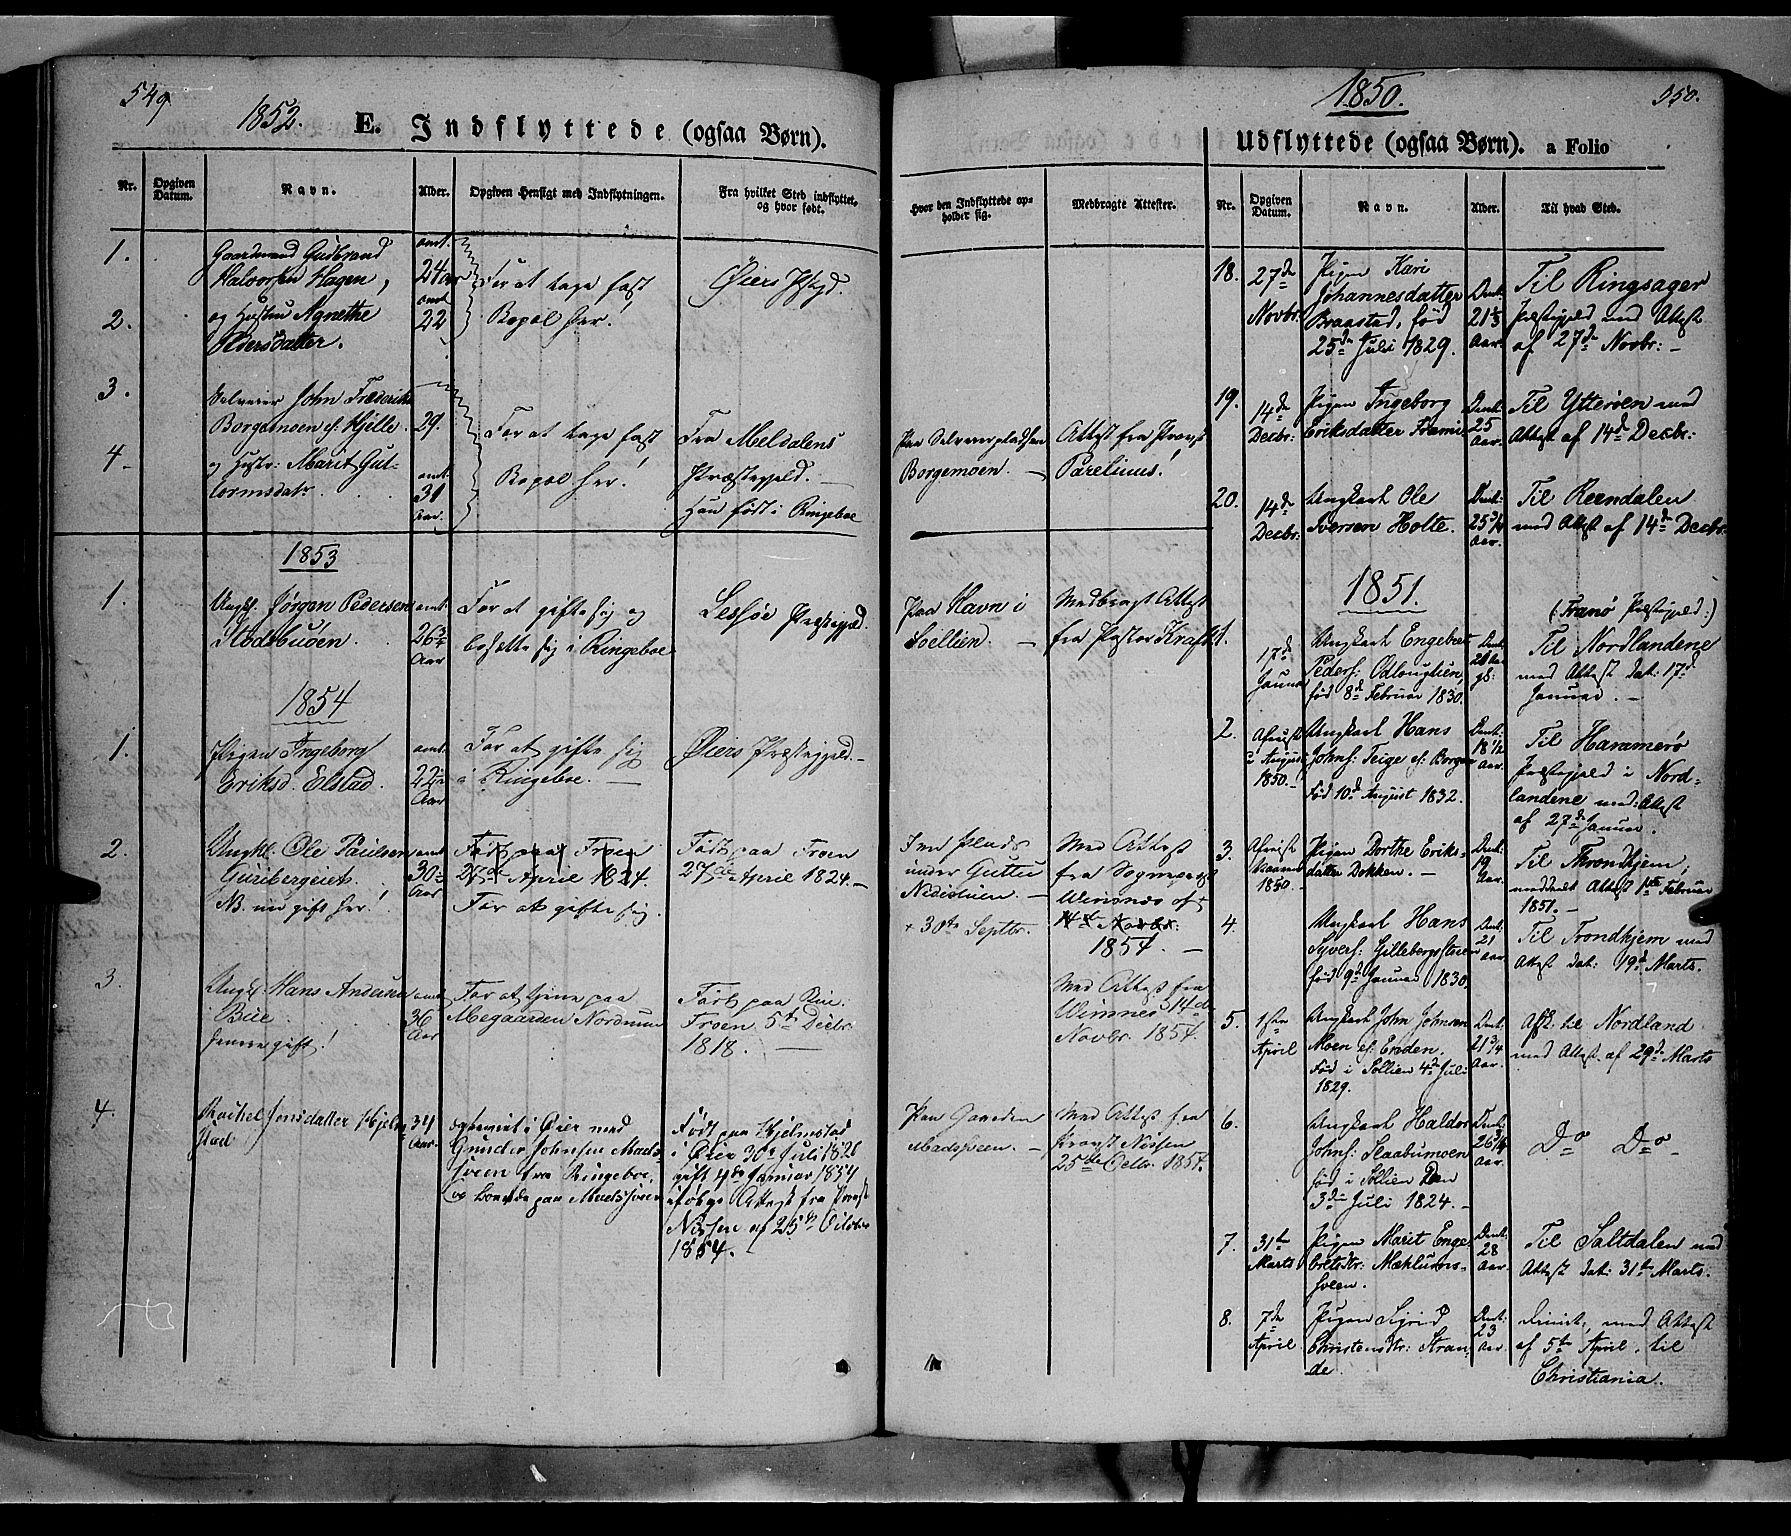 SAH, Ringebu prestekontor, Ministerialbok nr. 6, 1848-1859, s. 549-550